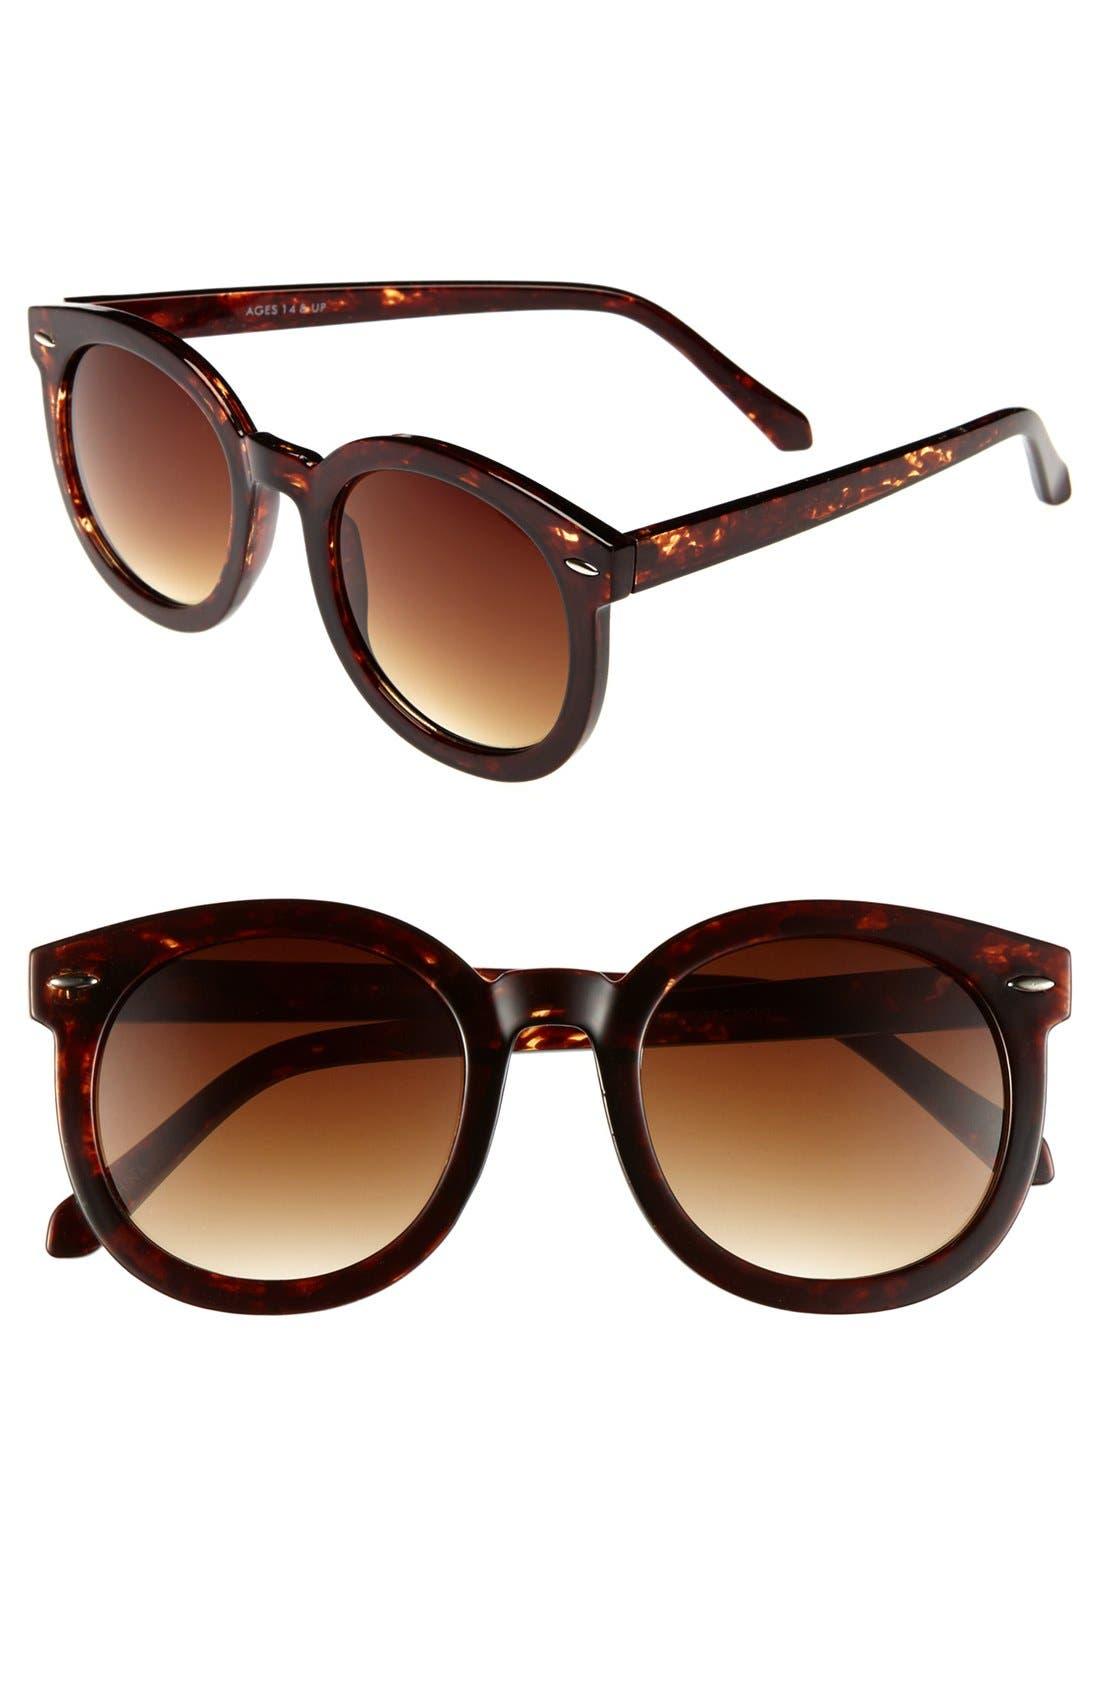 Alternate Image 1 Selected - FE NY 'Abbey Road' Sunglasses